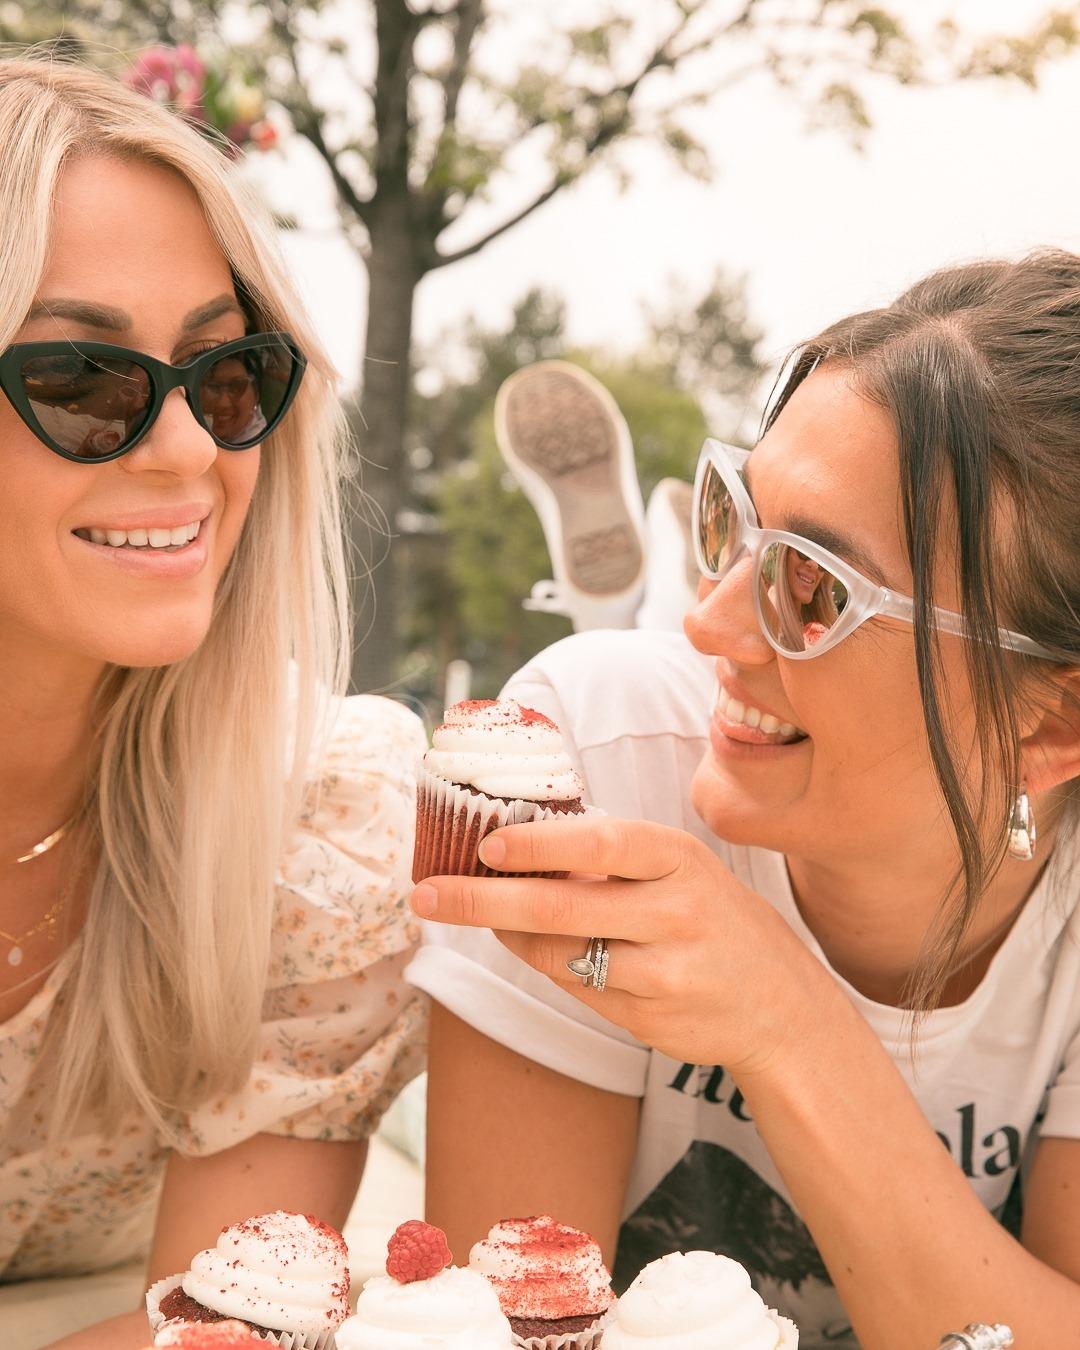 Best Eco-Friendly Sunglasses - SWWAY